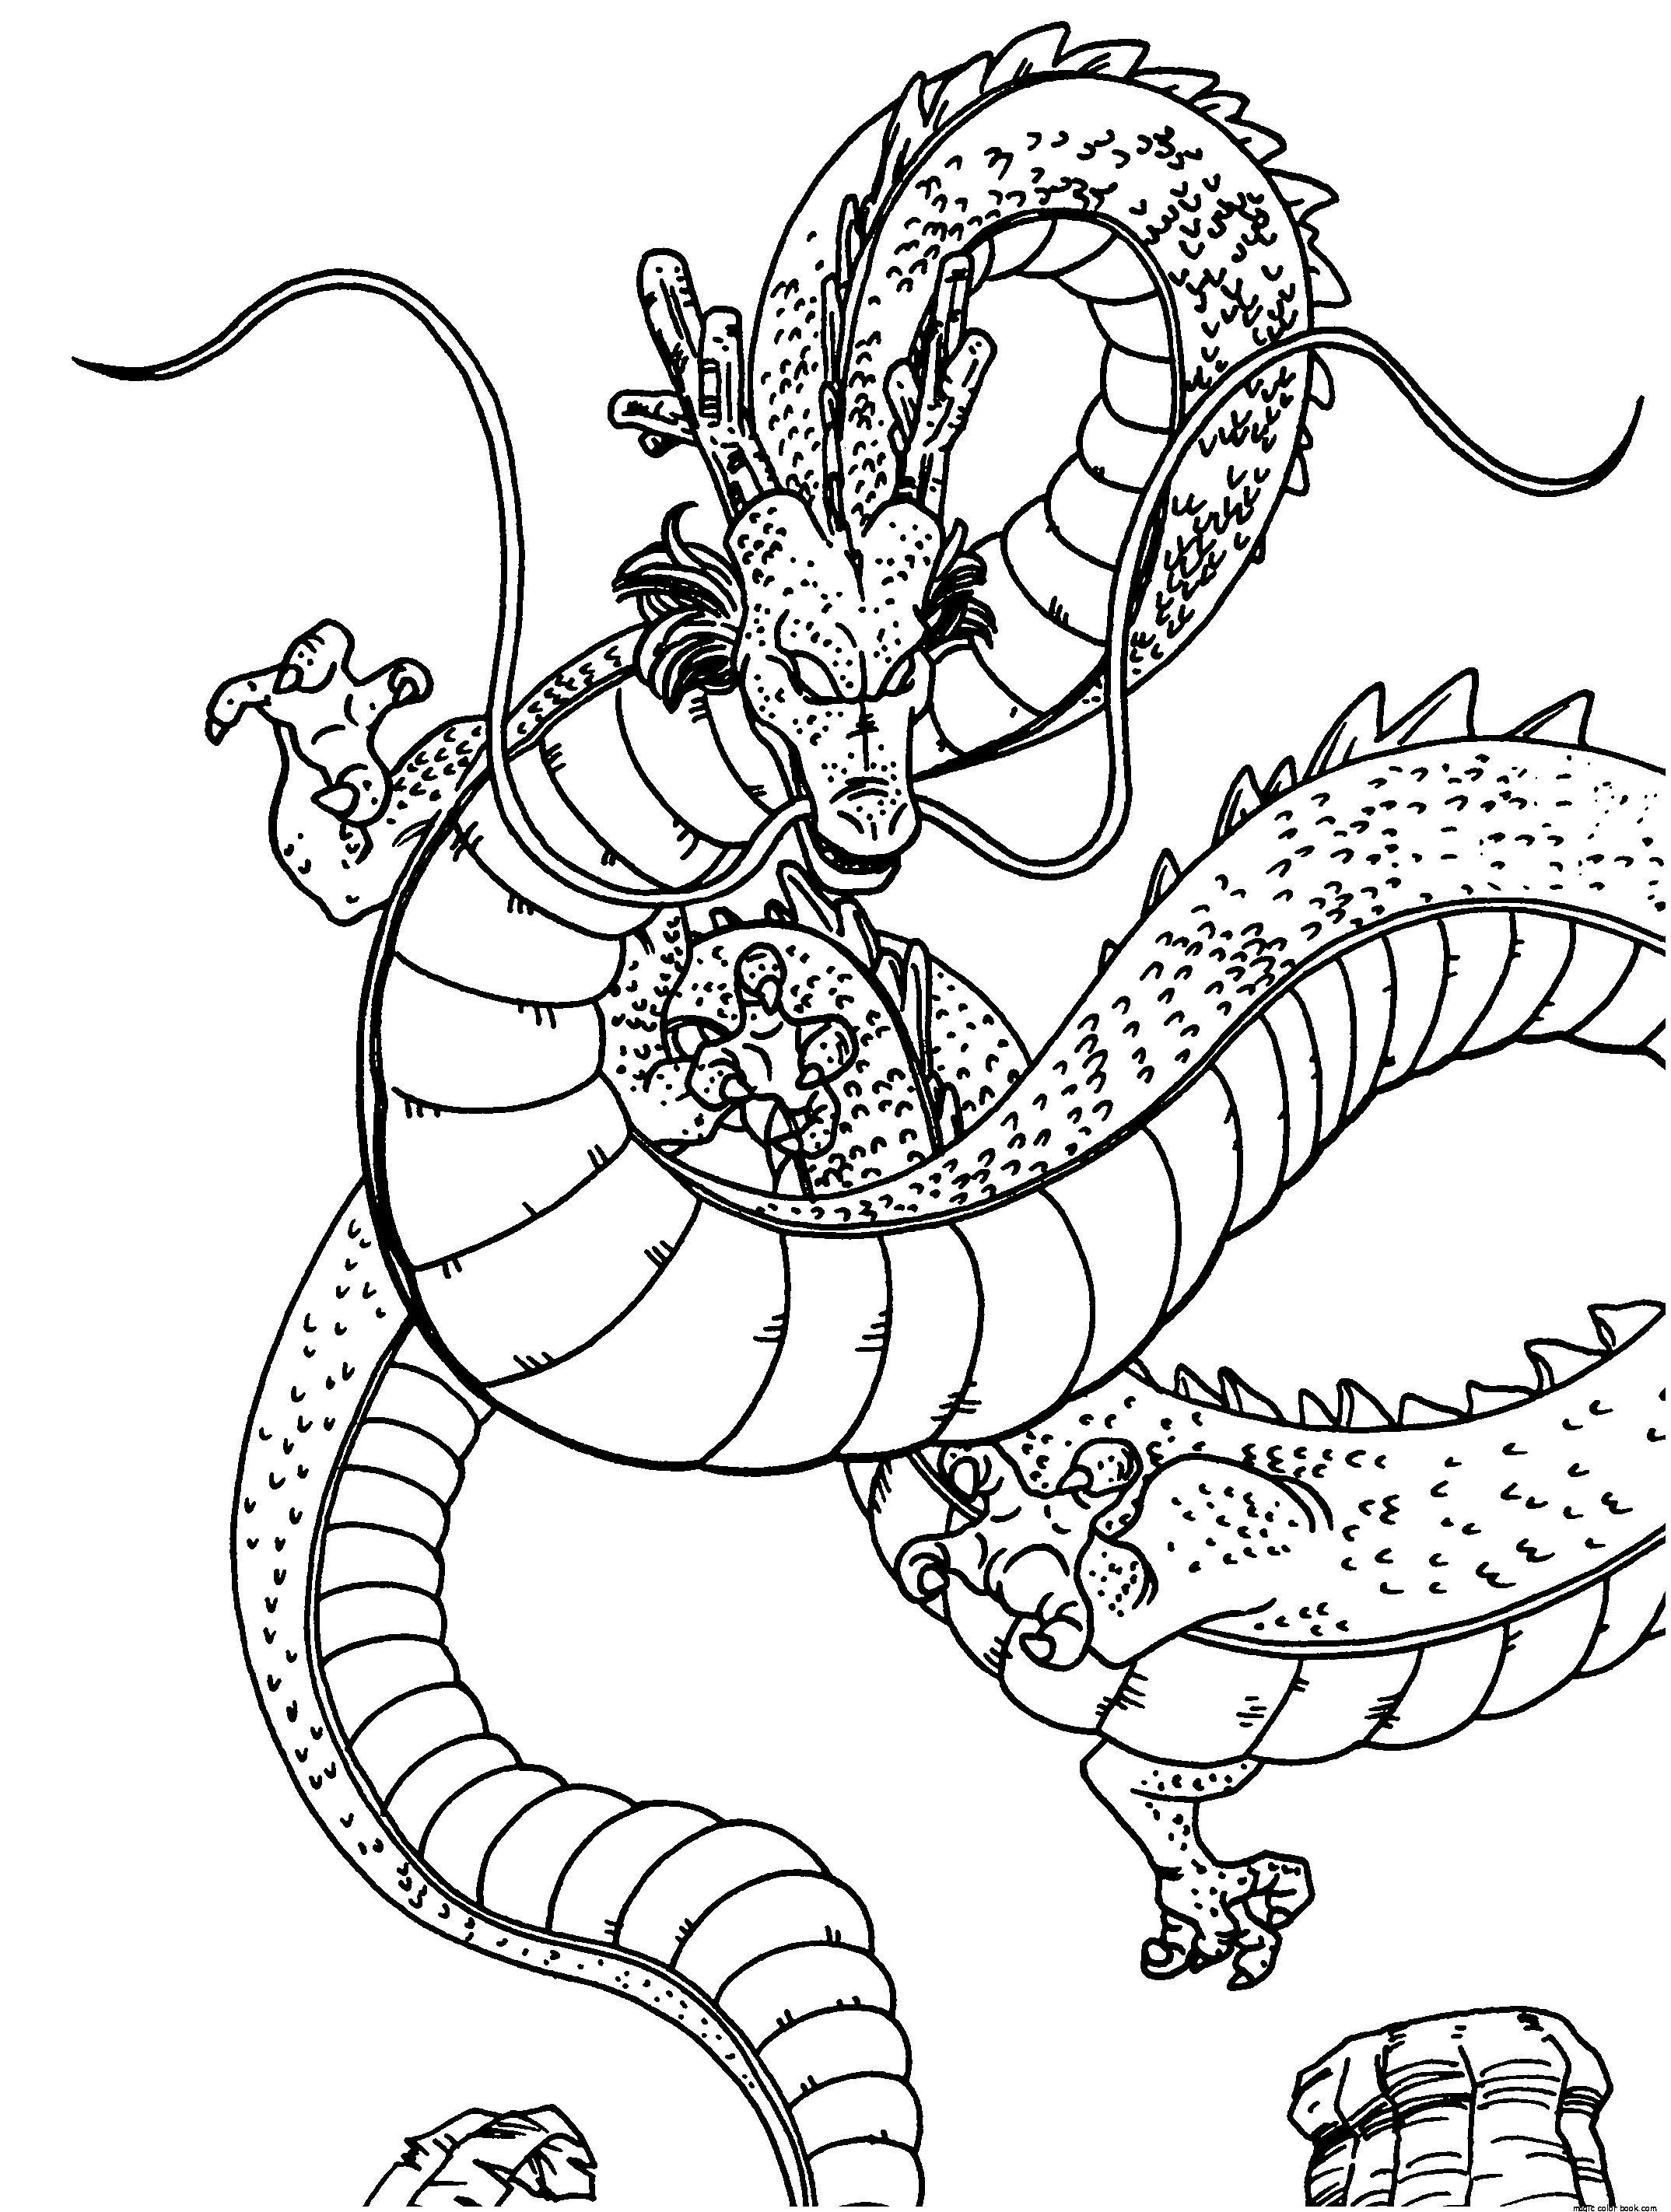 Printable Dragon Ball Z Coloring Pages 31 Hd Arilitv Com